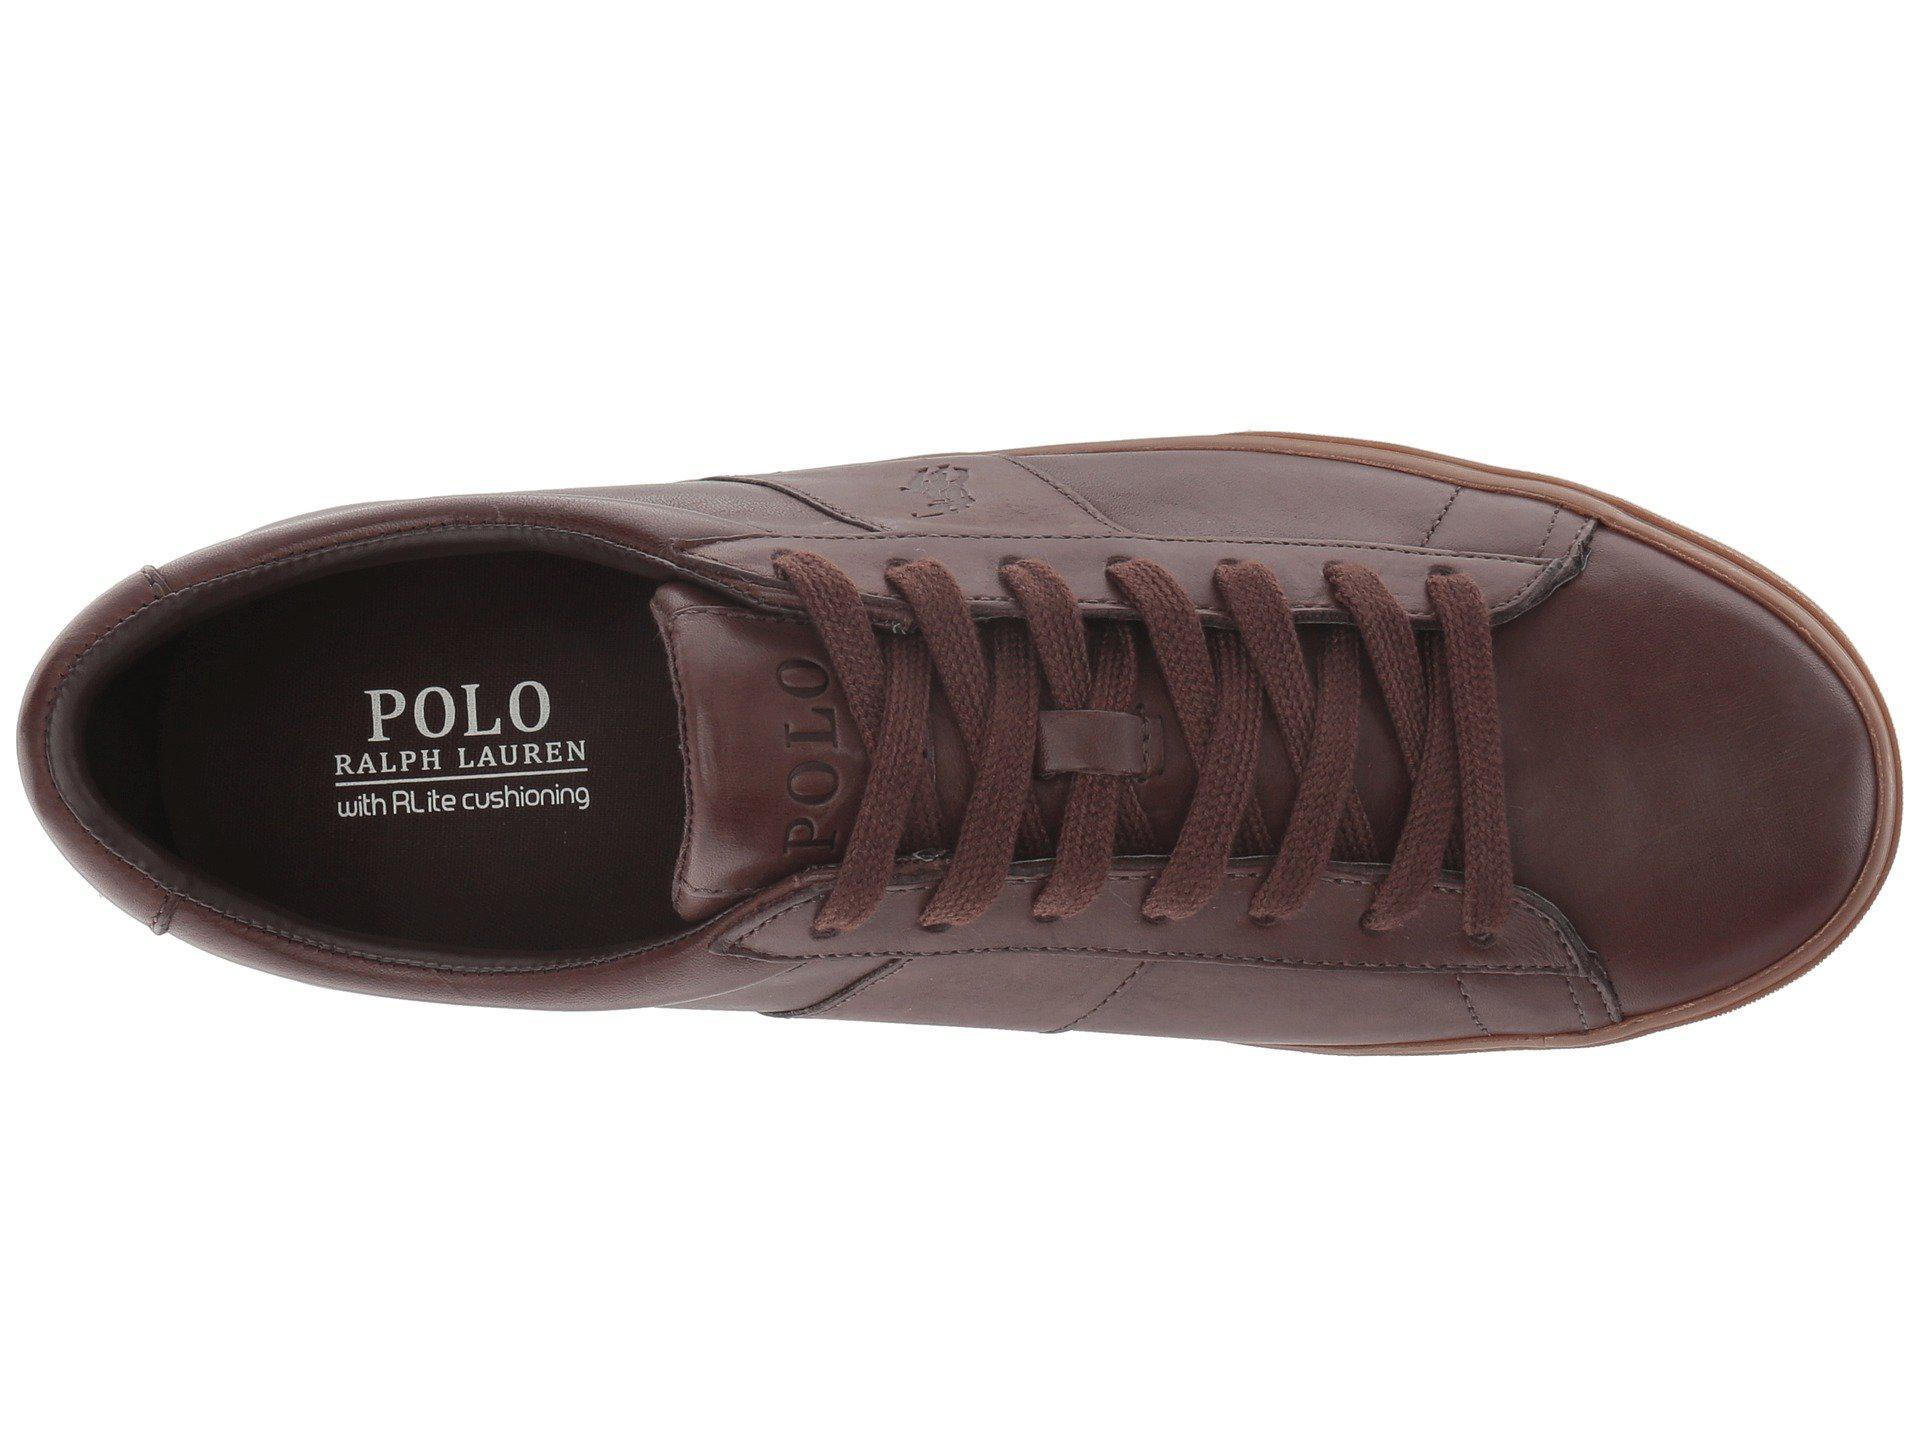 a40dd47a4c6 Lyst - Polo Ralph Lauren Sayer (black black) Men s Shoes in Brown ...